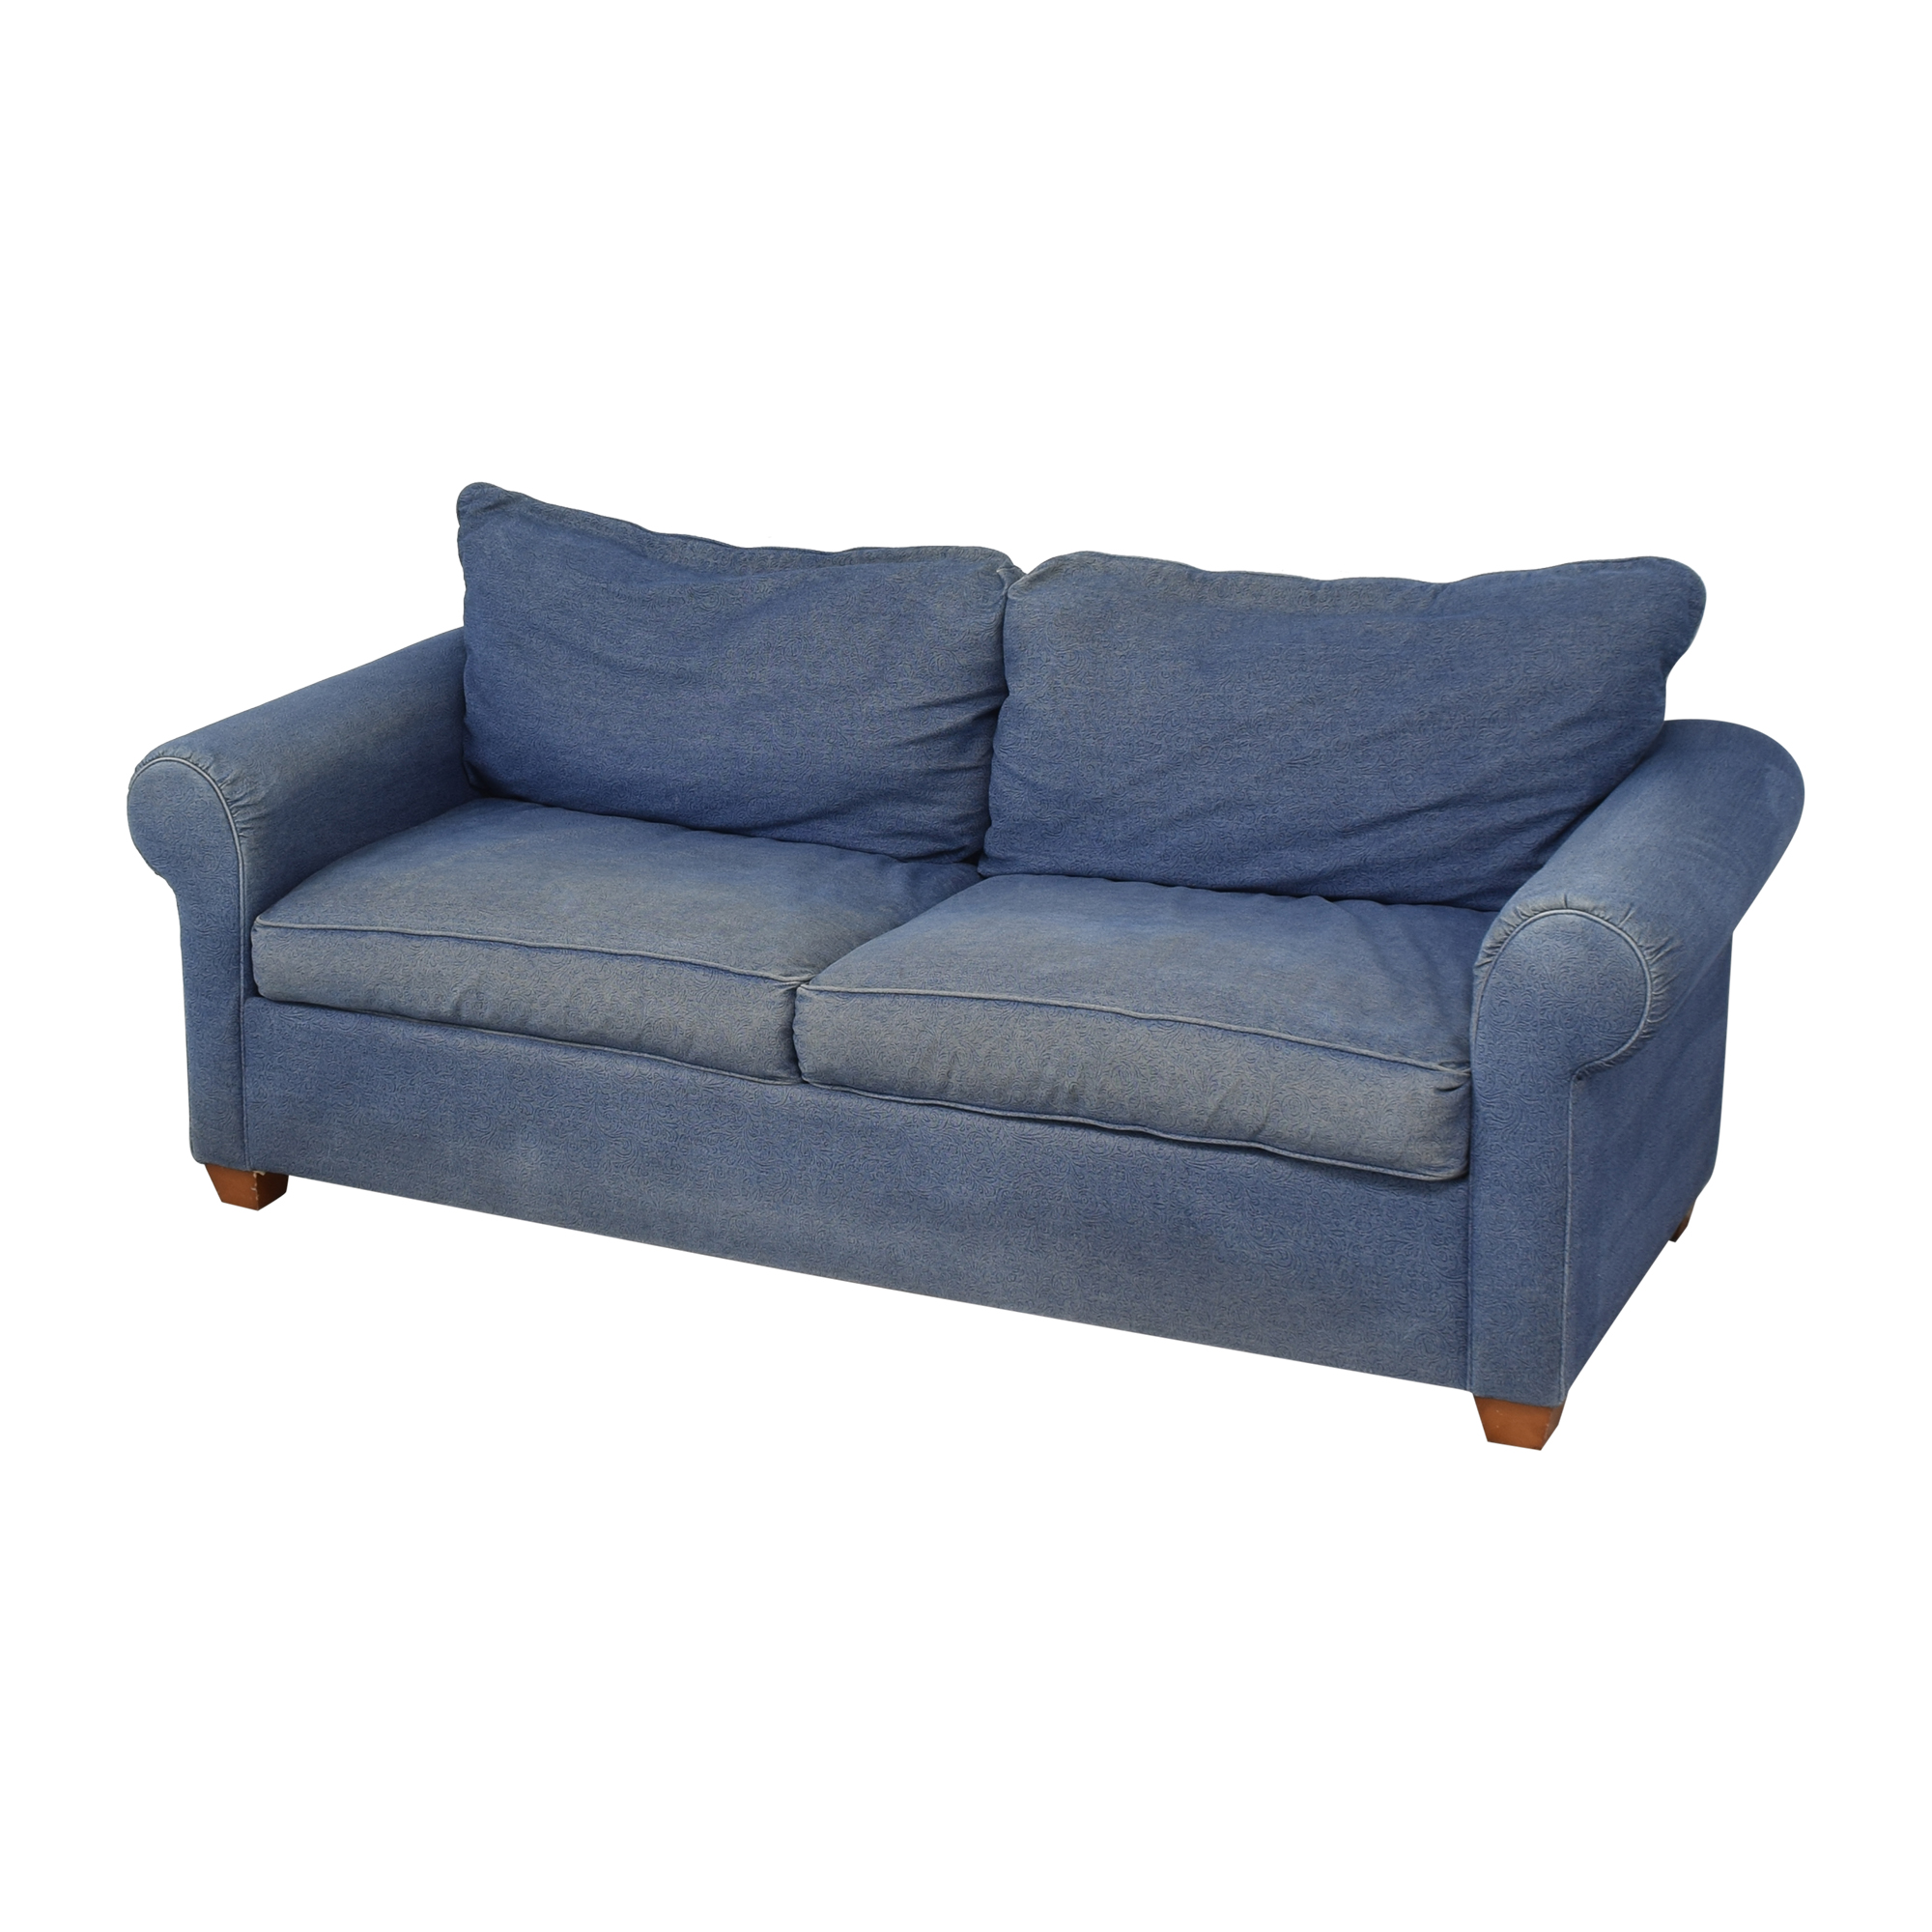 Leggett & Platt Leggett & Platt Denim Queen Pull Out Sofa discount